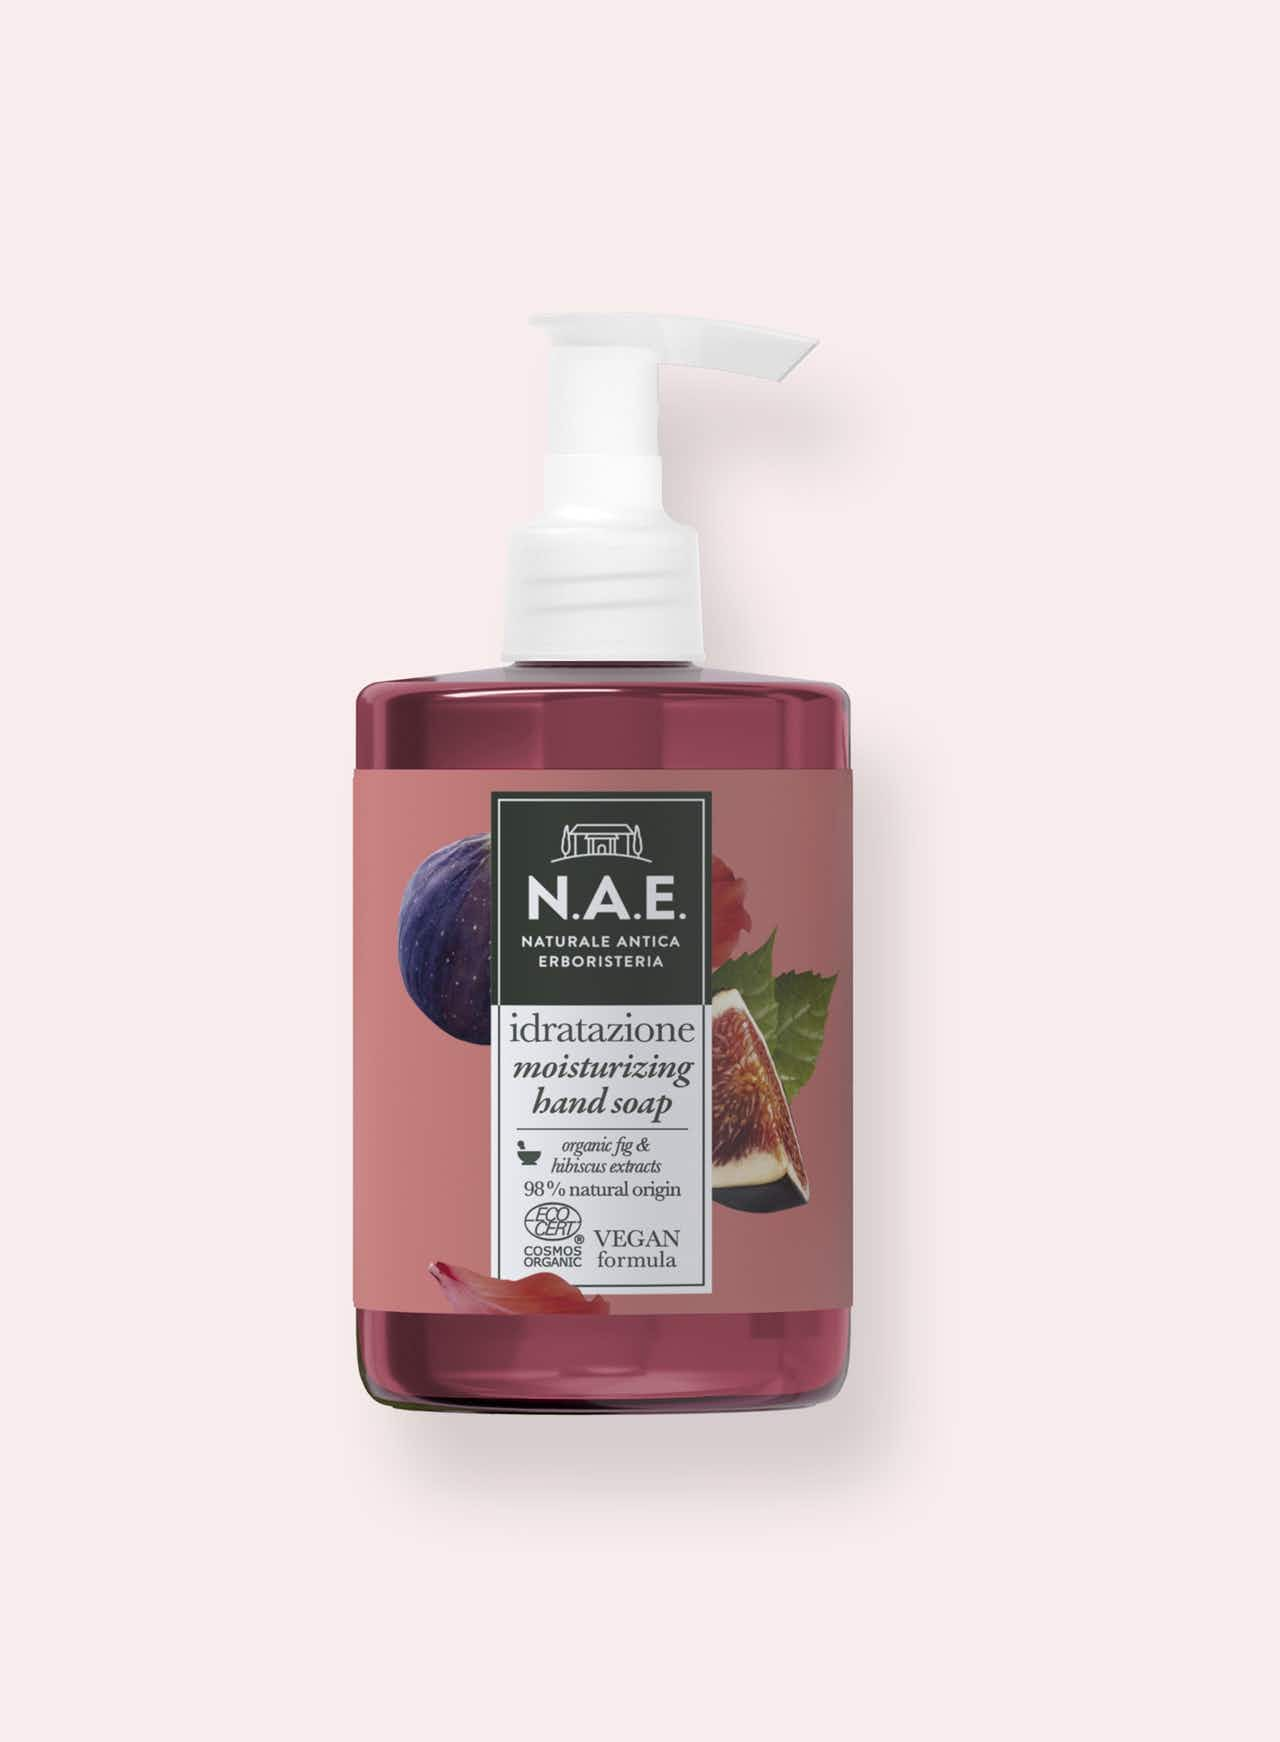 Moisturizing Liquid Hand Soap,300ml